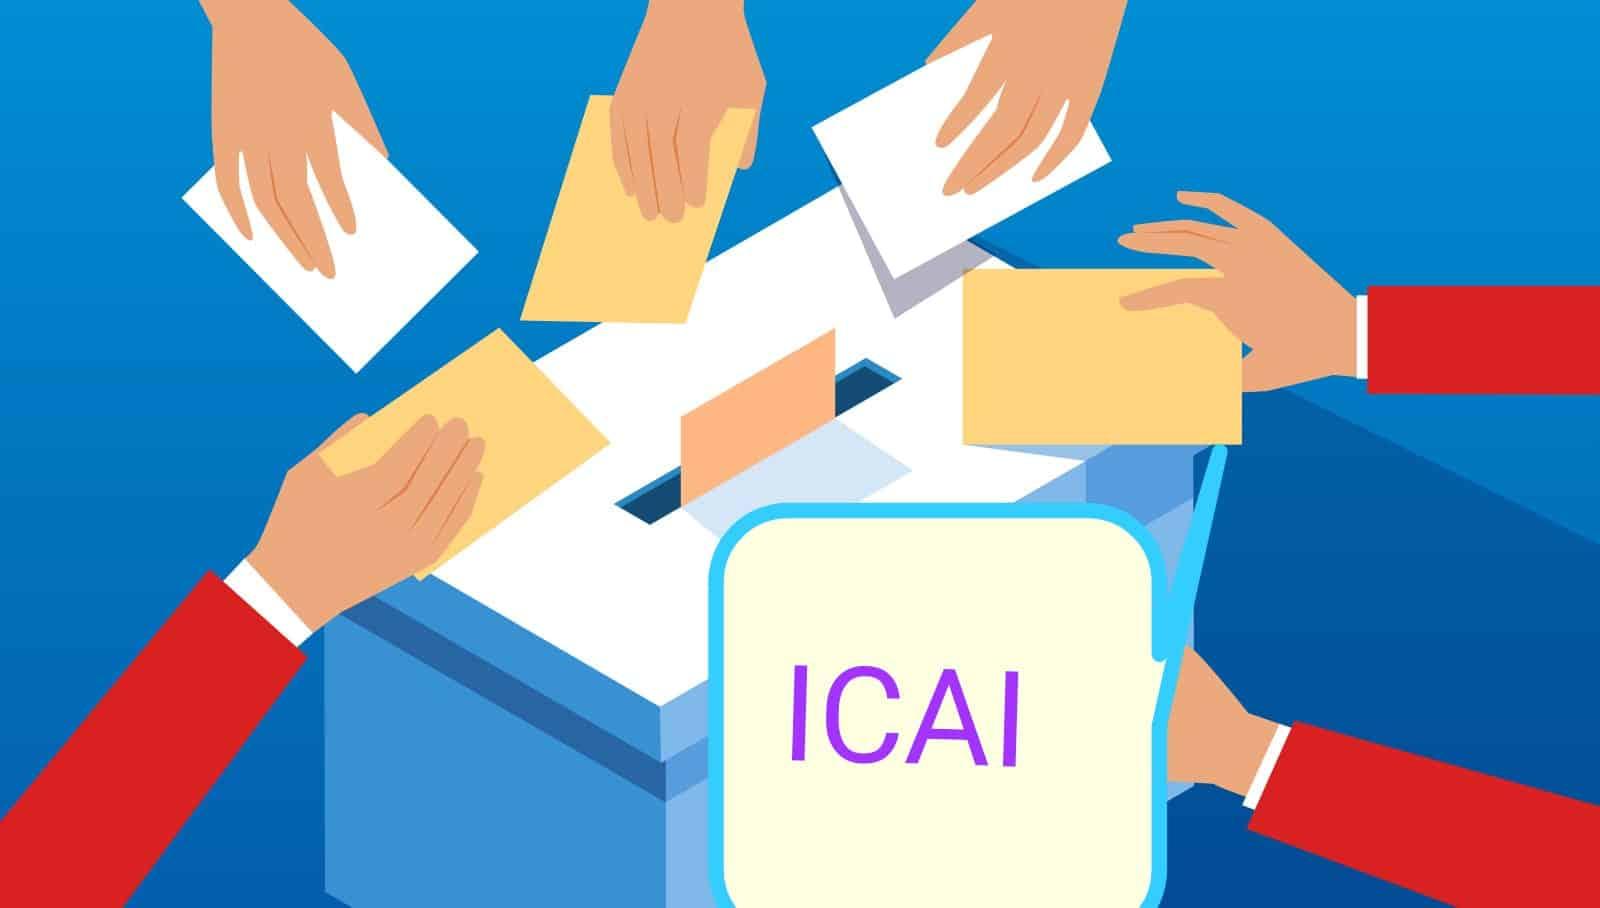 ICAI ELECTION 2021